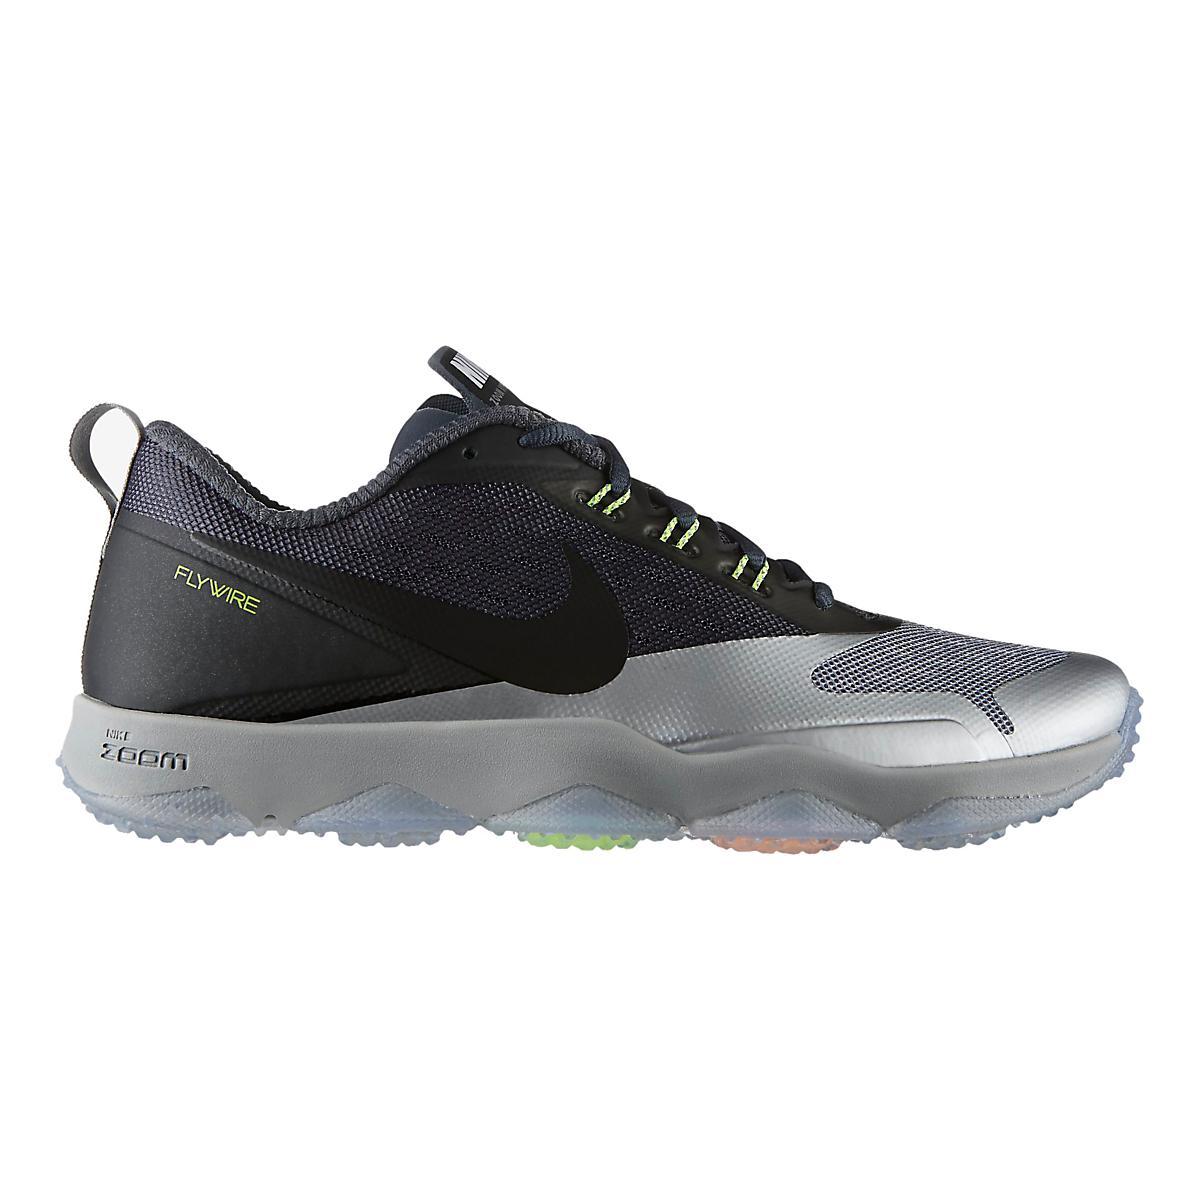 Hypercross Air Nike Trainer Tr Zoom Fitn TKJl3uF1c5